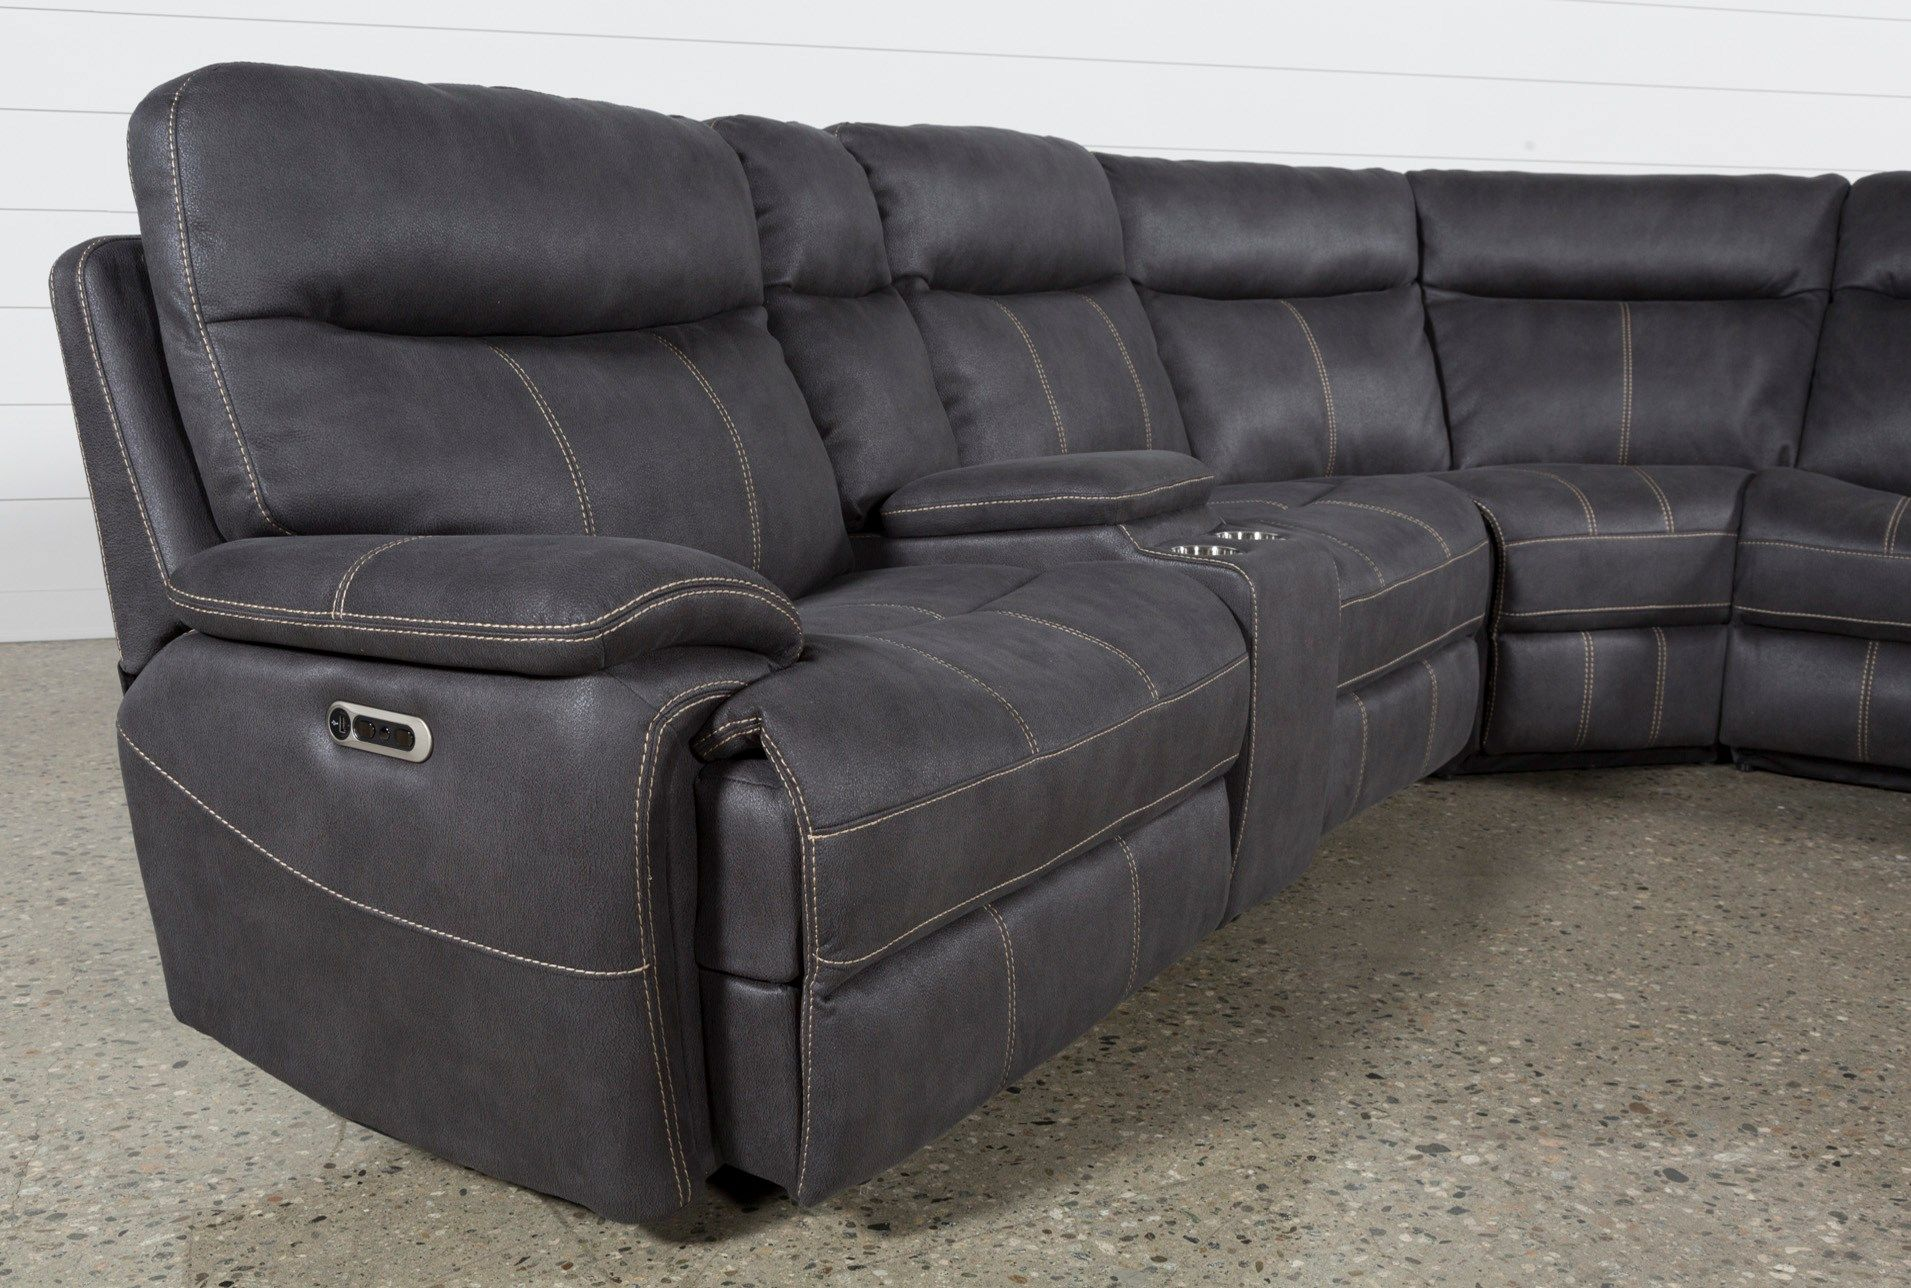 Homelegance Maeve Grey Power Reclining Sectional Sofa 8260gy Power Reclining Sectional Sofa Grey Leather Sofa Living Room Reclining Sectional